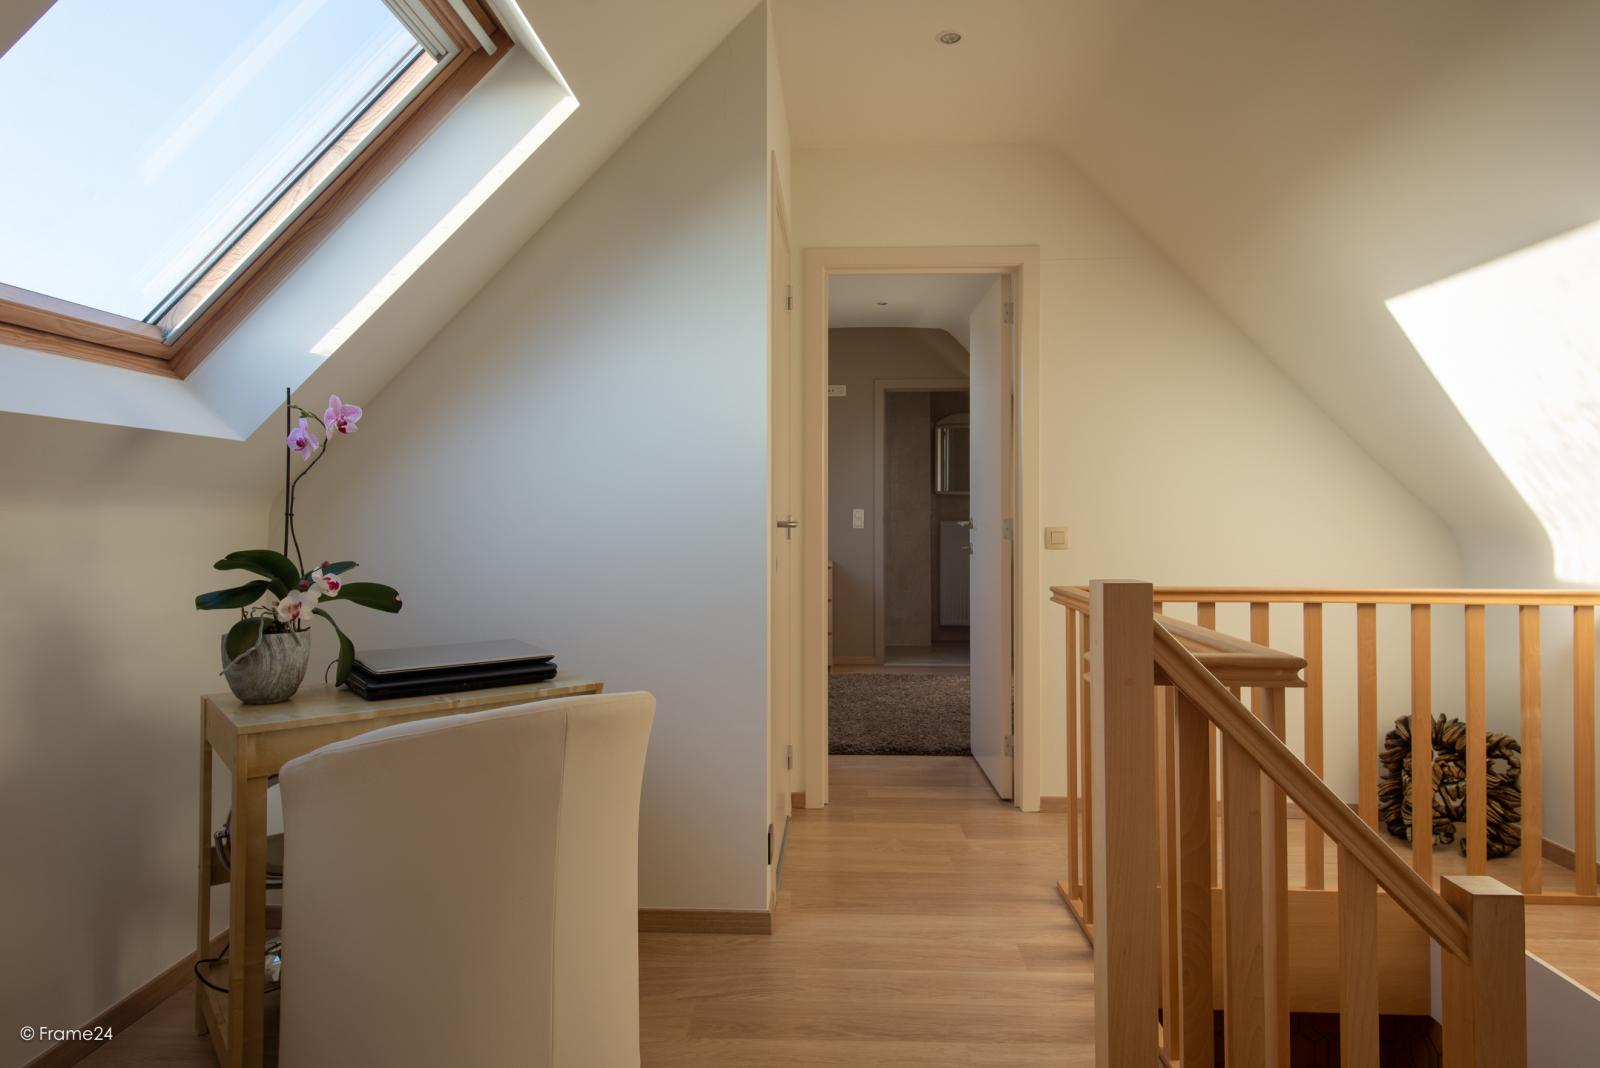 Riant dakappartement (130 m²) met zonnig terras in residentie 'Eyserhof' te Wijnegem! afbeelding 17